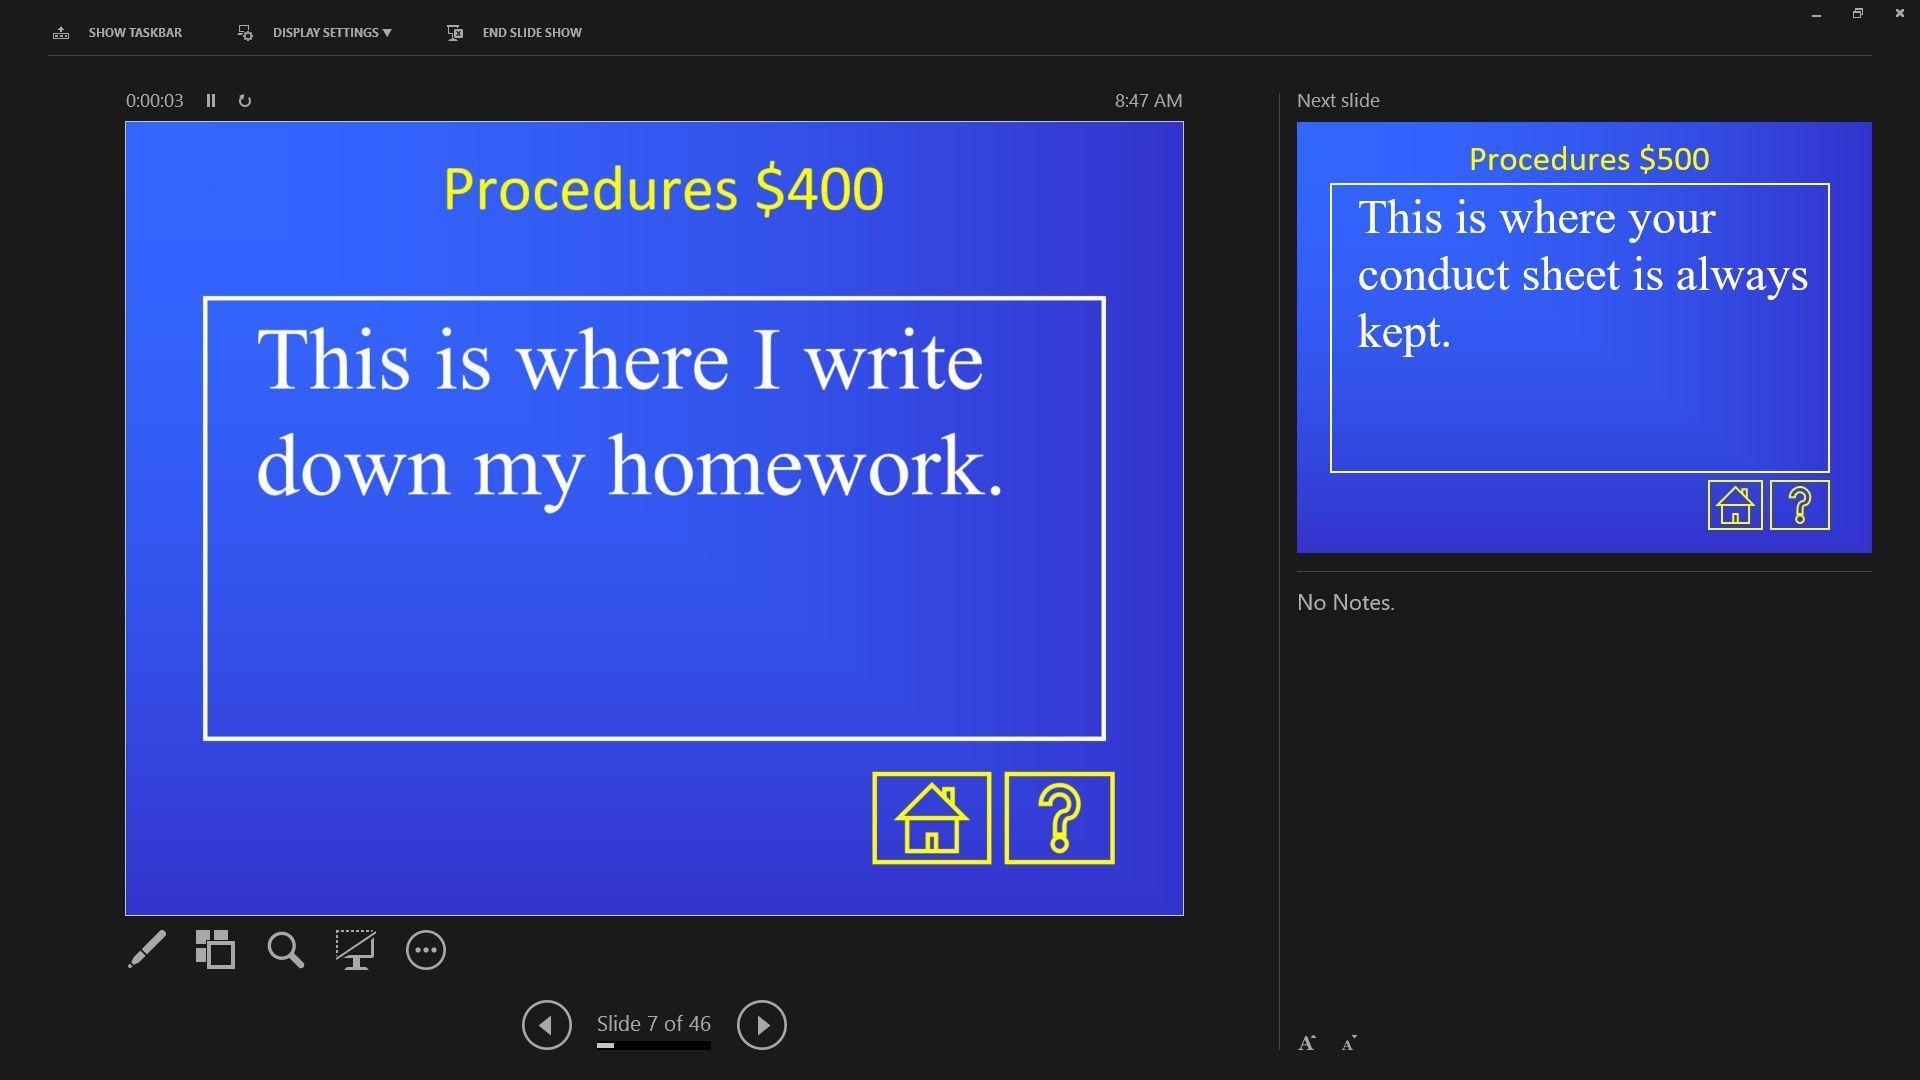 008 Stupendou Jeopardy Template Google Slide Photo  Slides Board Blank BestFull